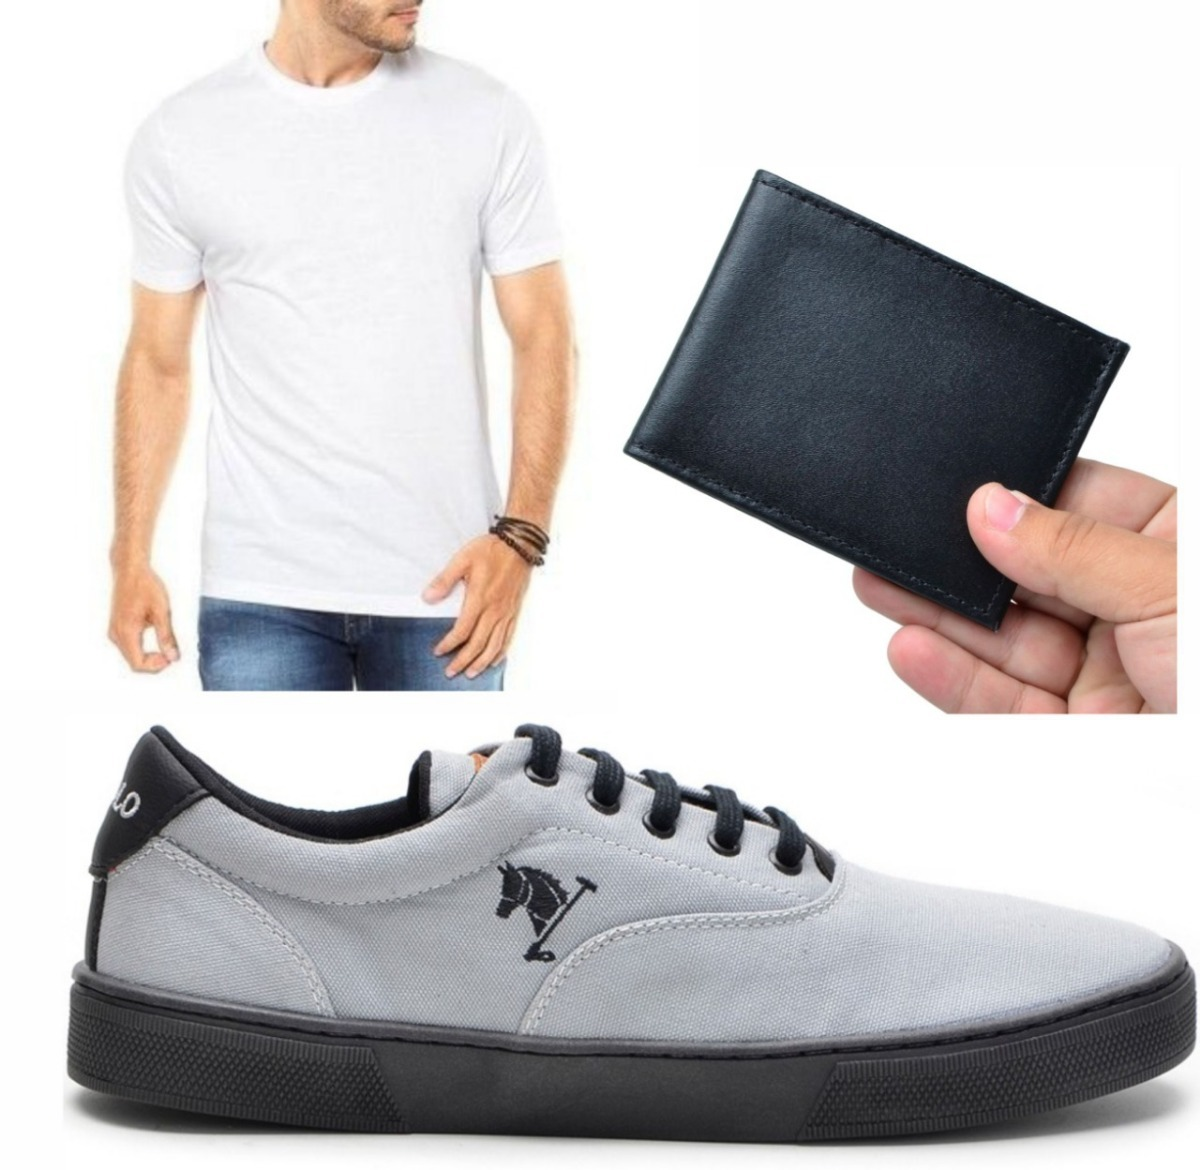 526fa48ec4bc9 tenis masculino sapatenis + camiseta +carteira slim polo joy. Carregando  zoom.